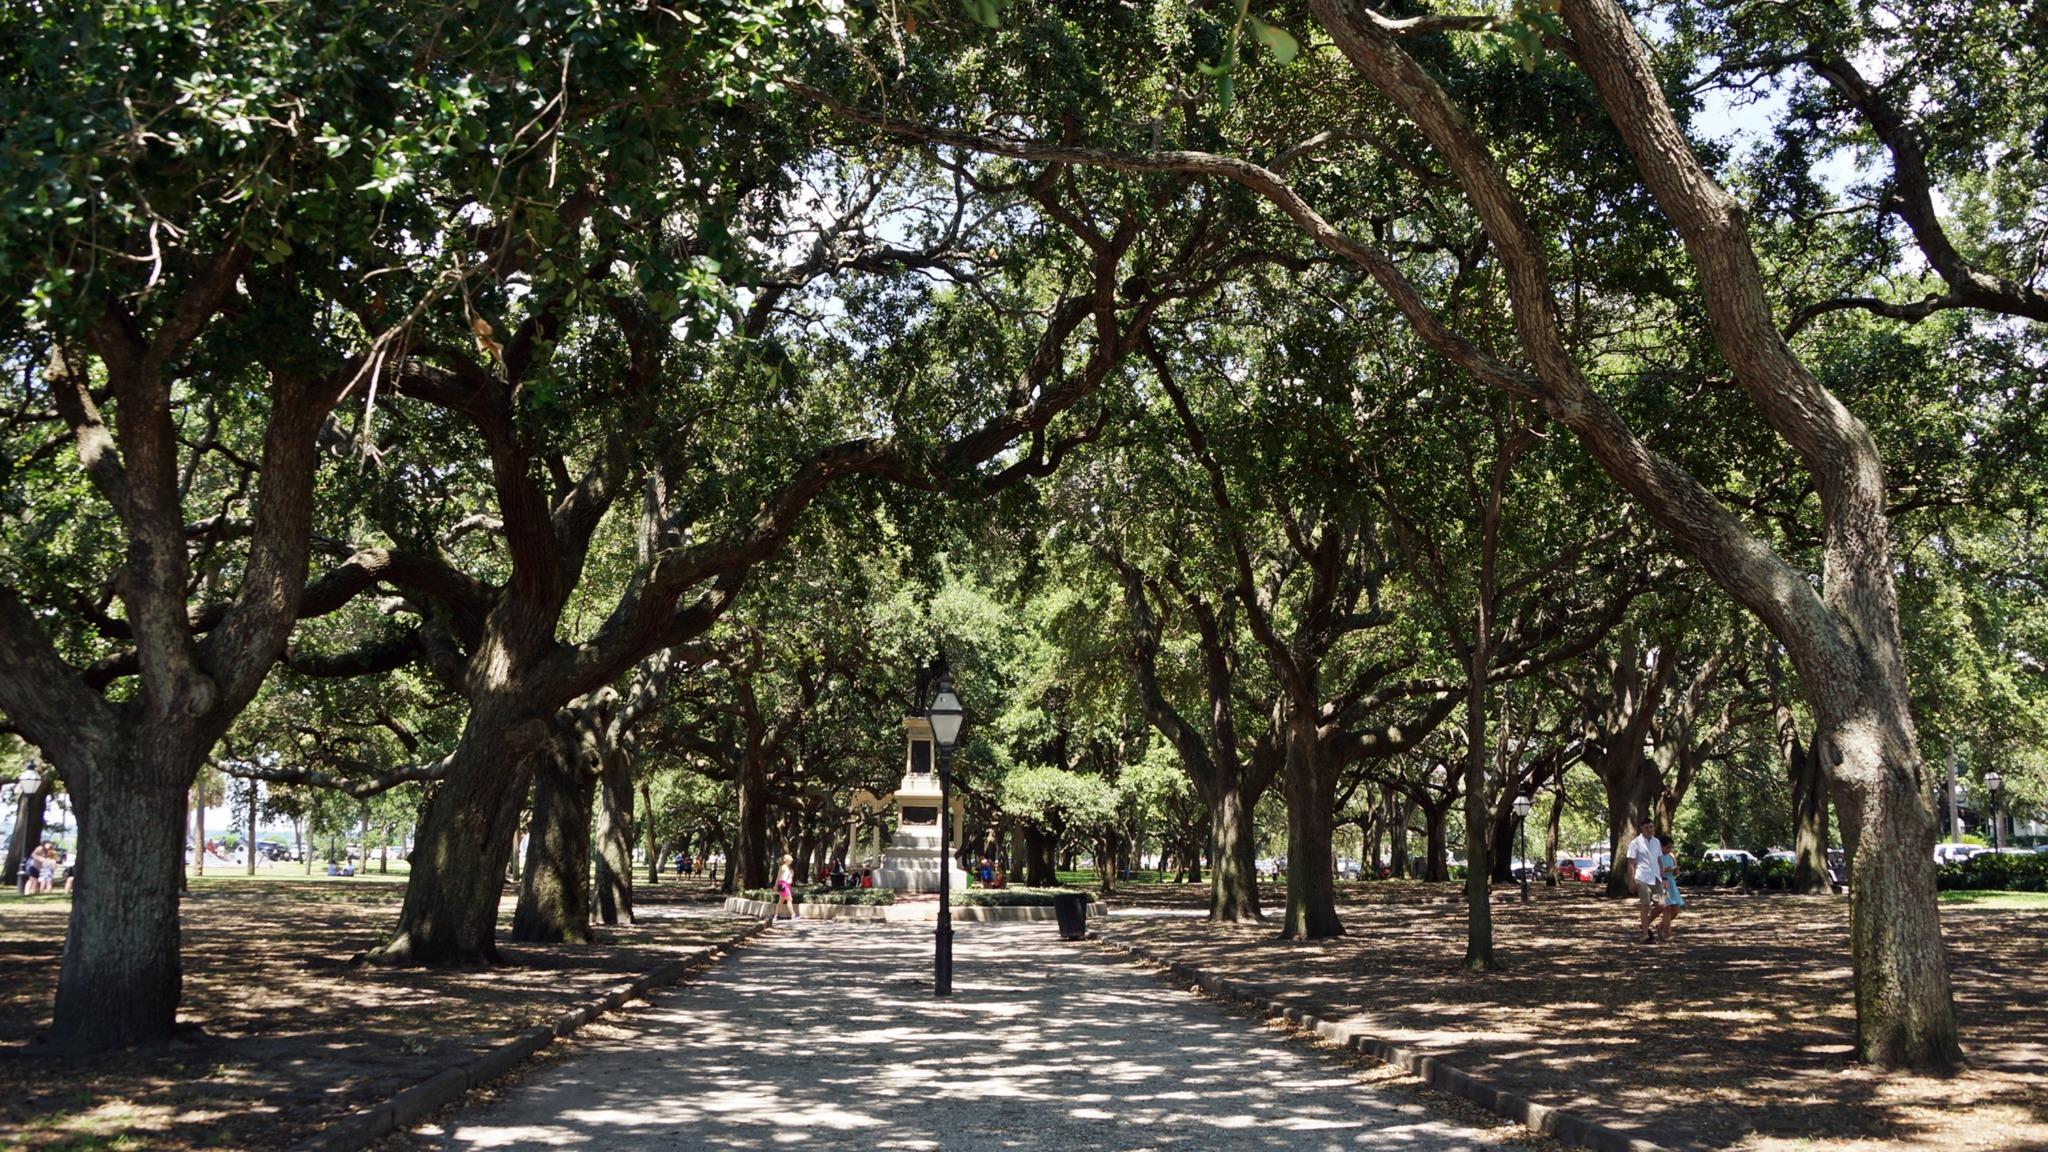 Walkway in Charleston, South Carolina's battery park